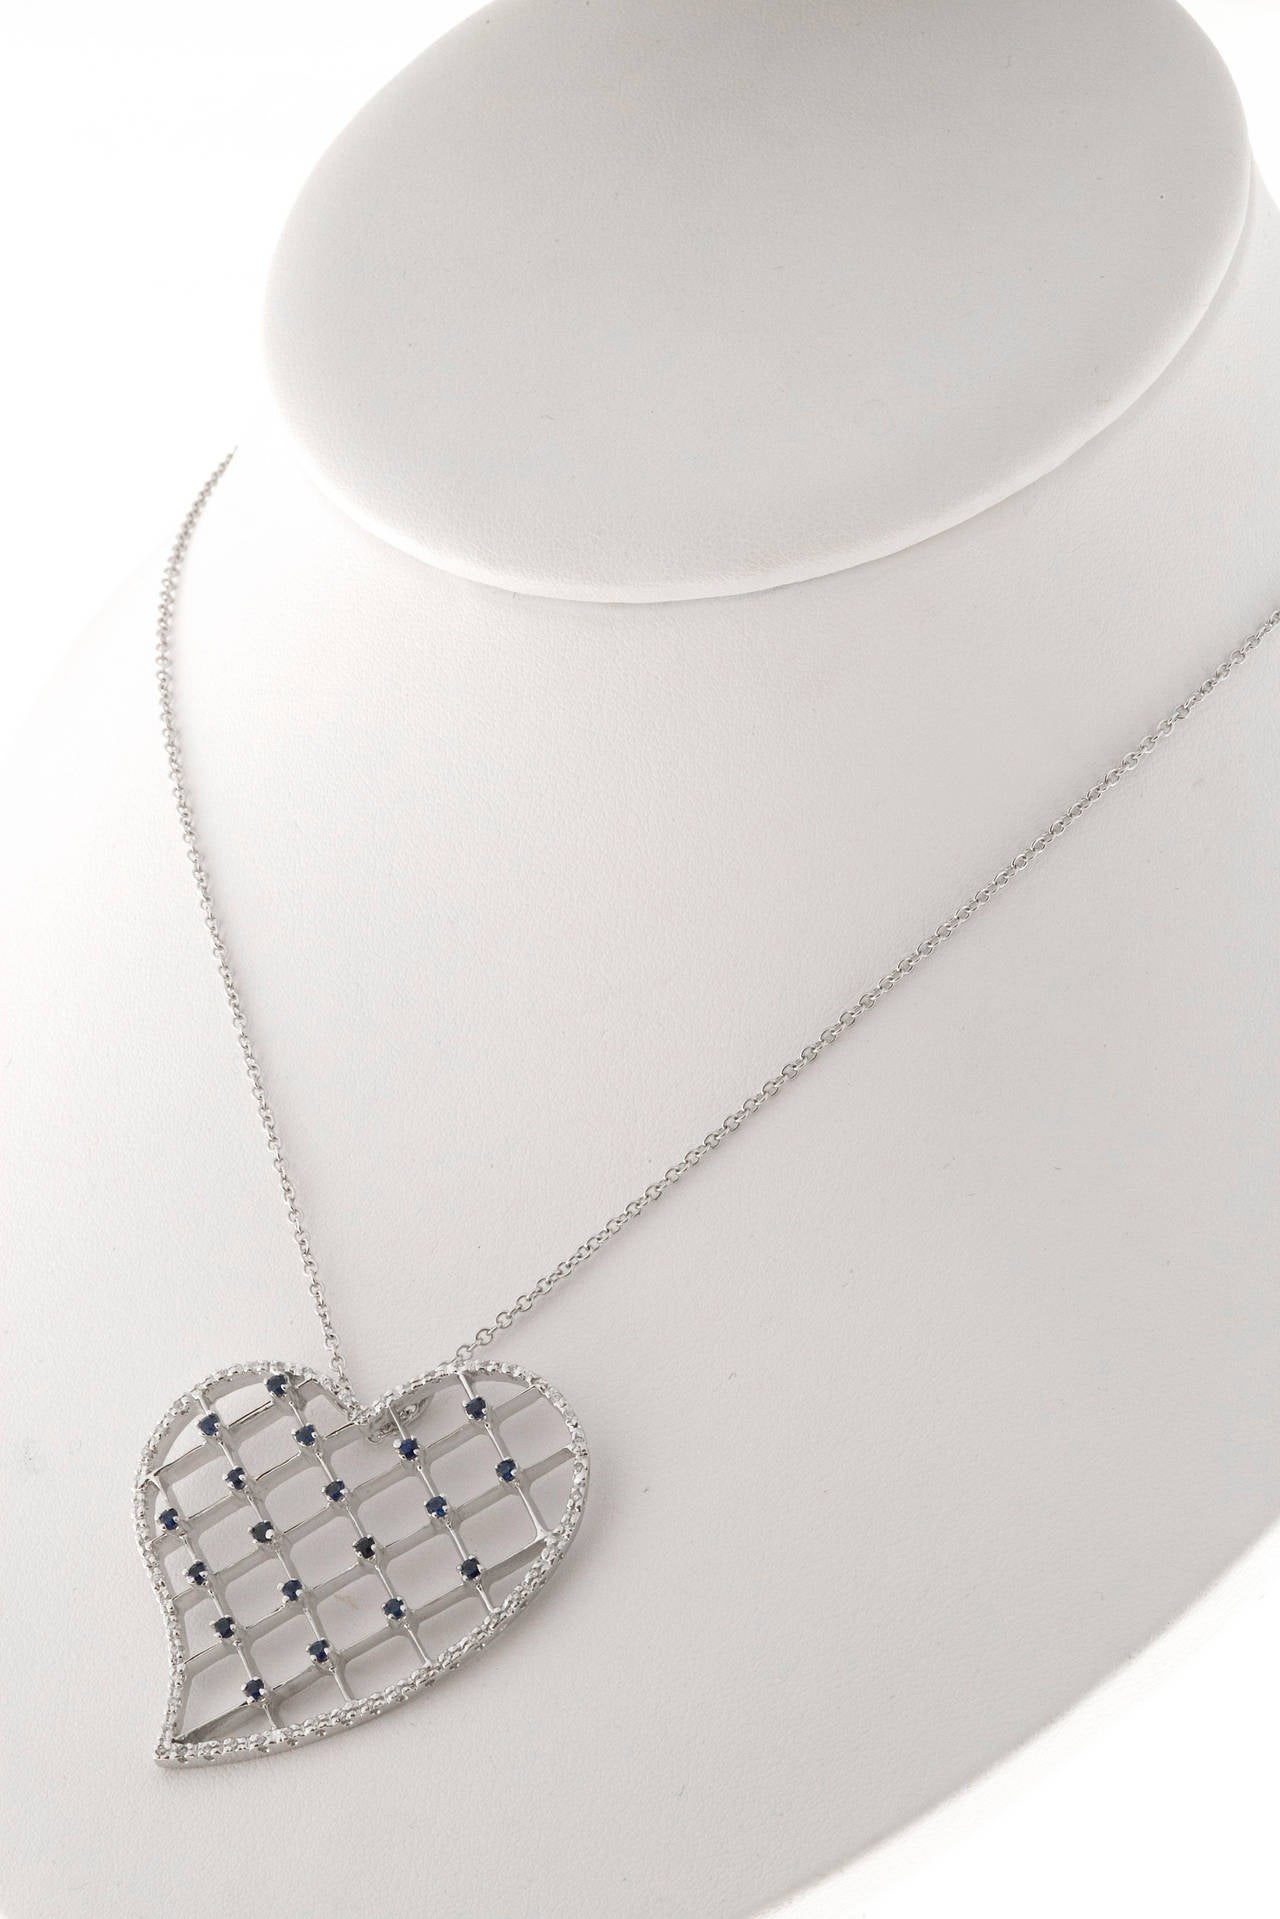 Sapphire Diamond Pave Gold Heart Pendant Necklace 5